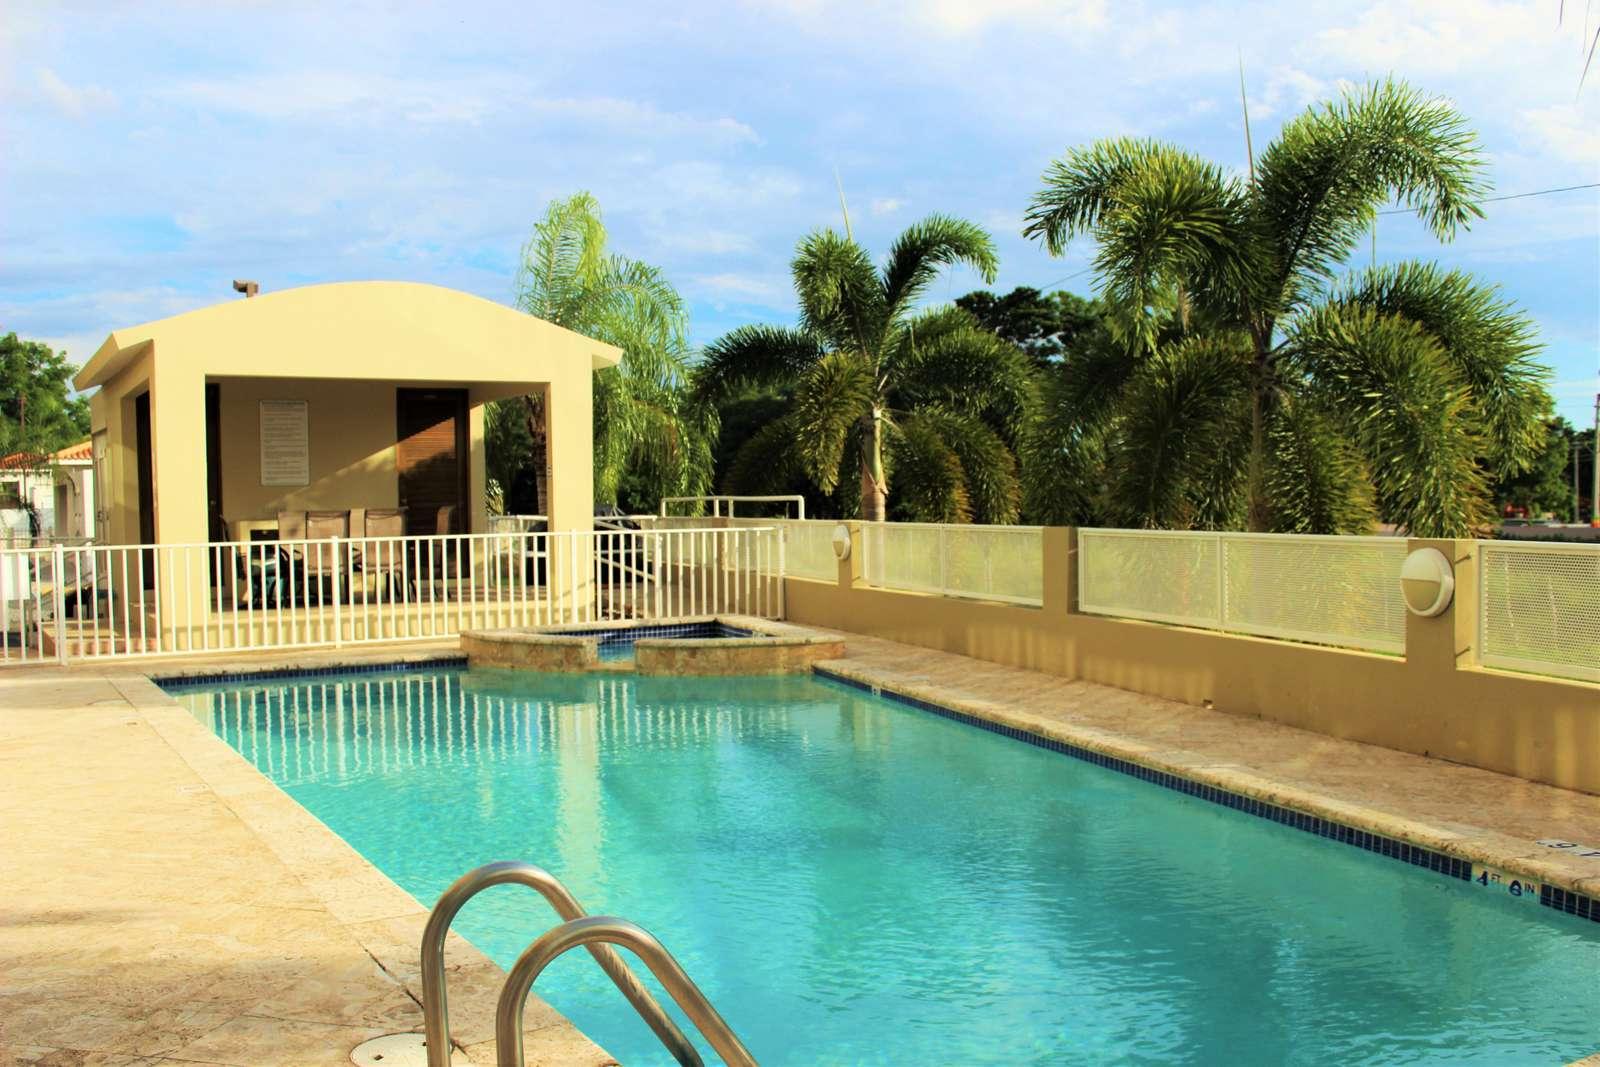 Pool facilities